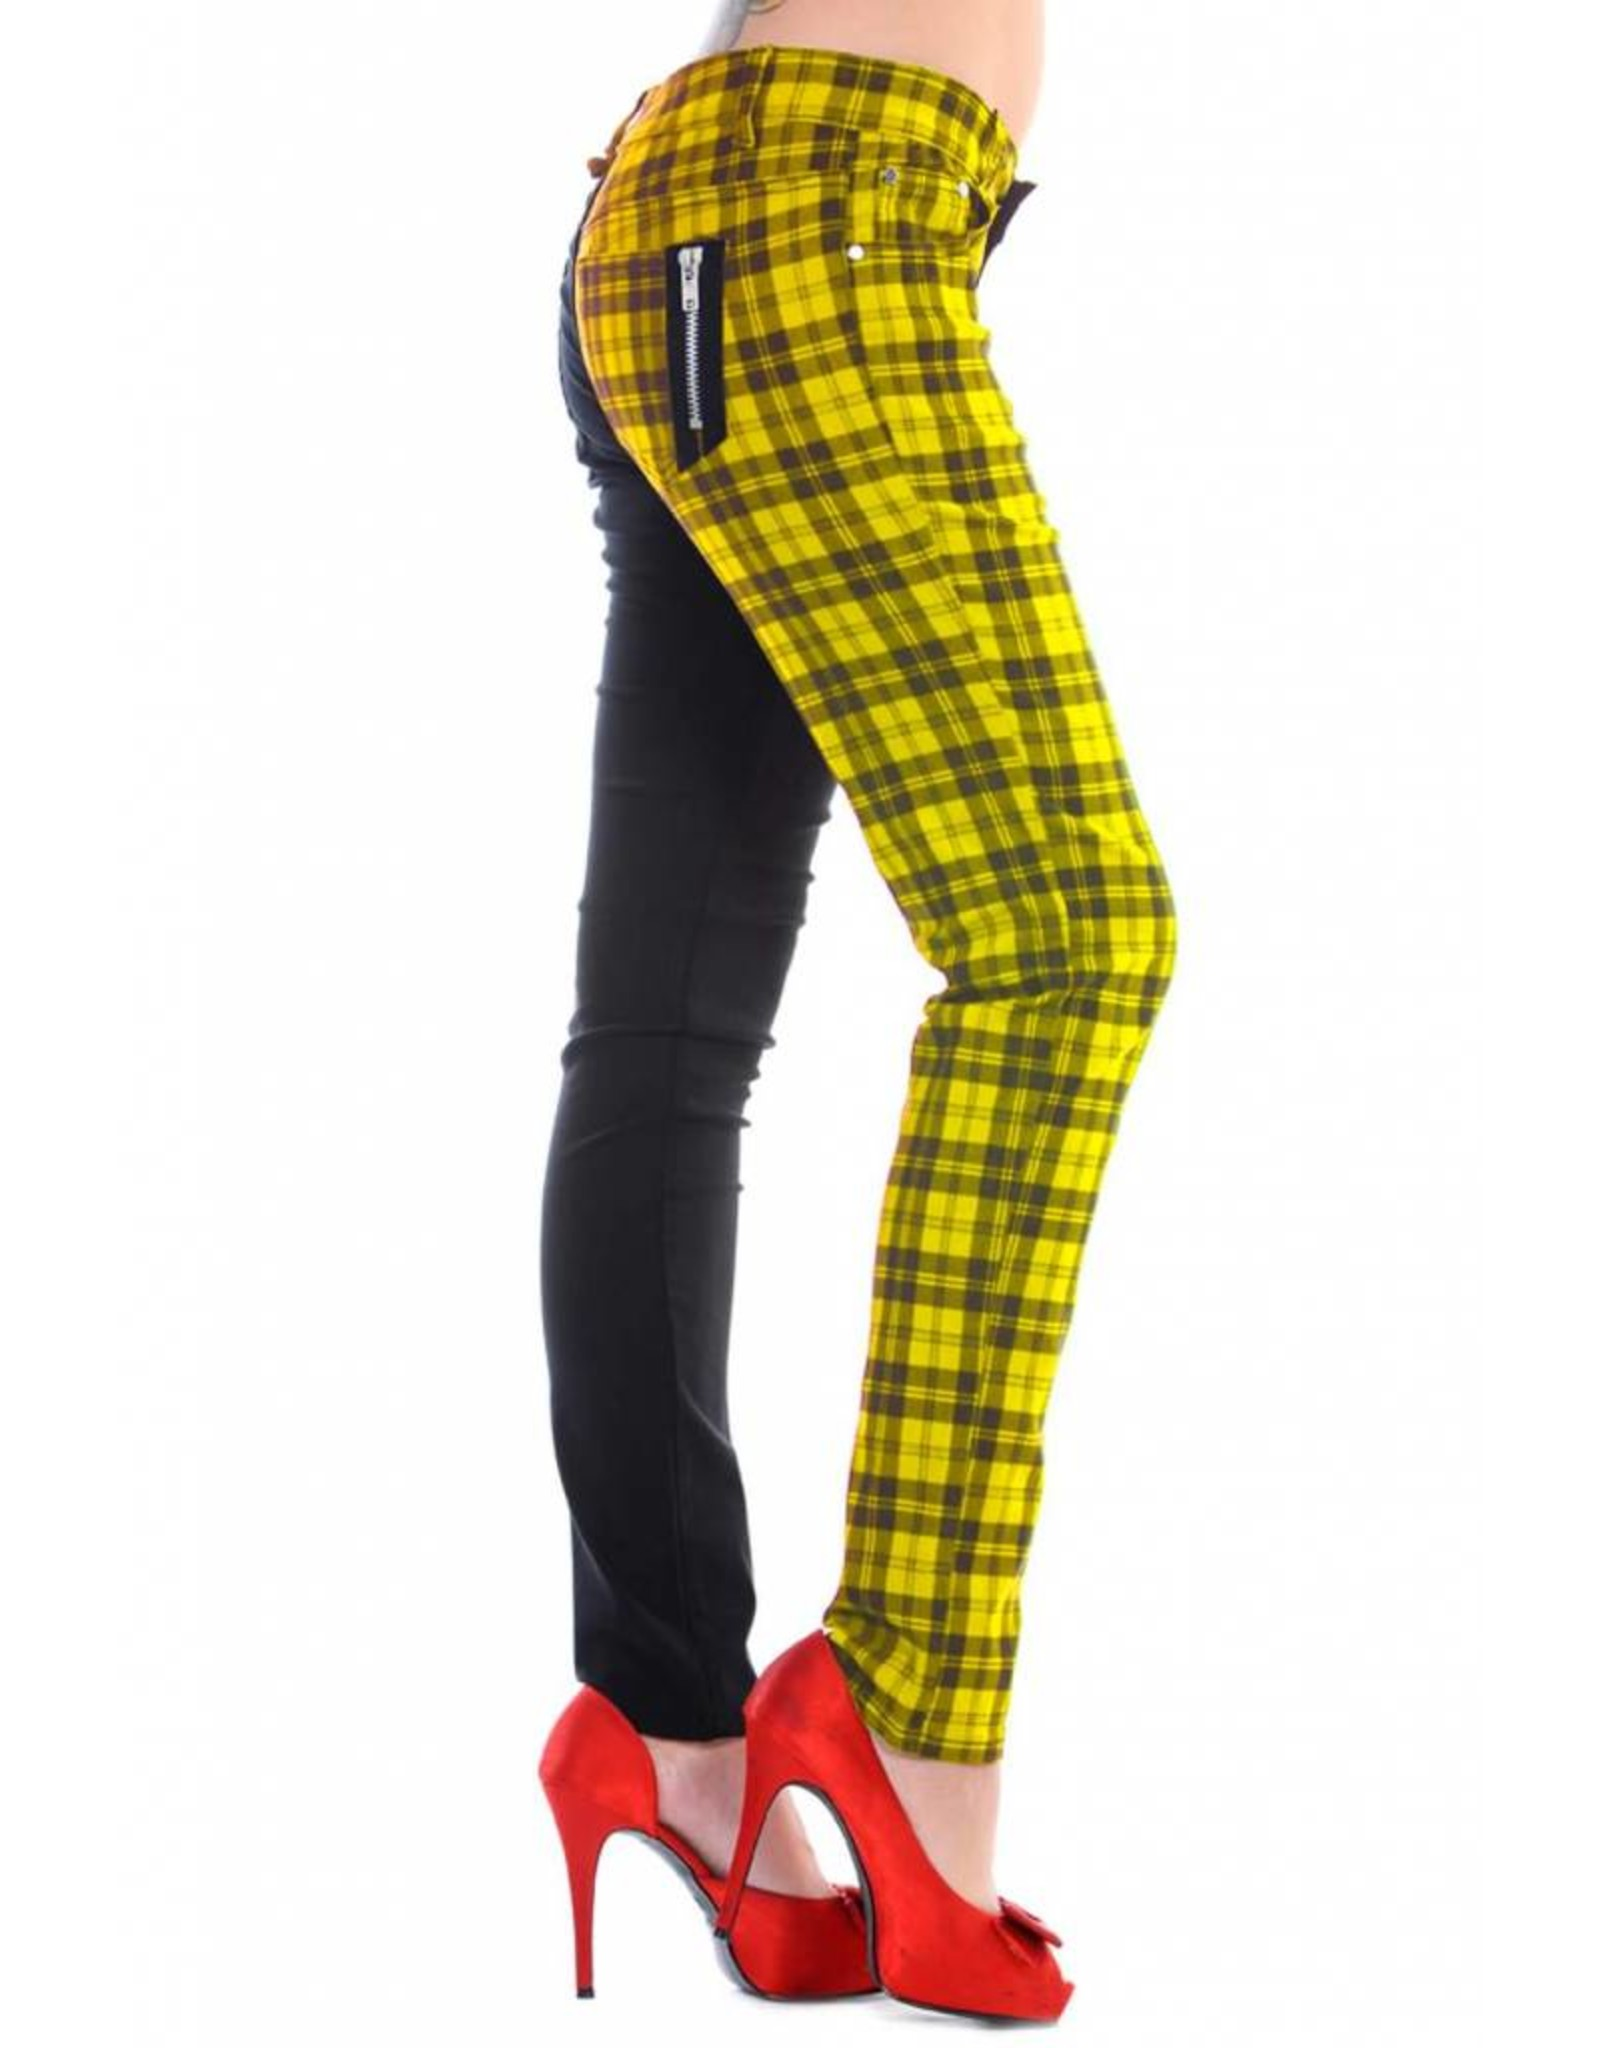 BANNED - Half Black/Checkered Yellow Pants